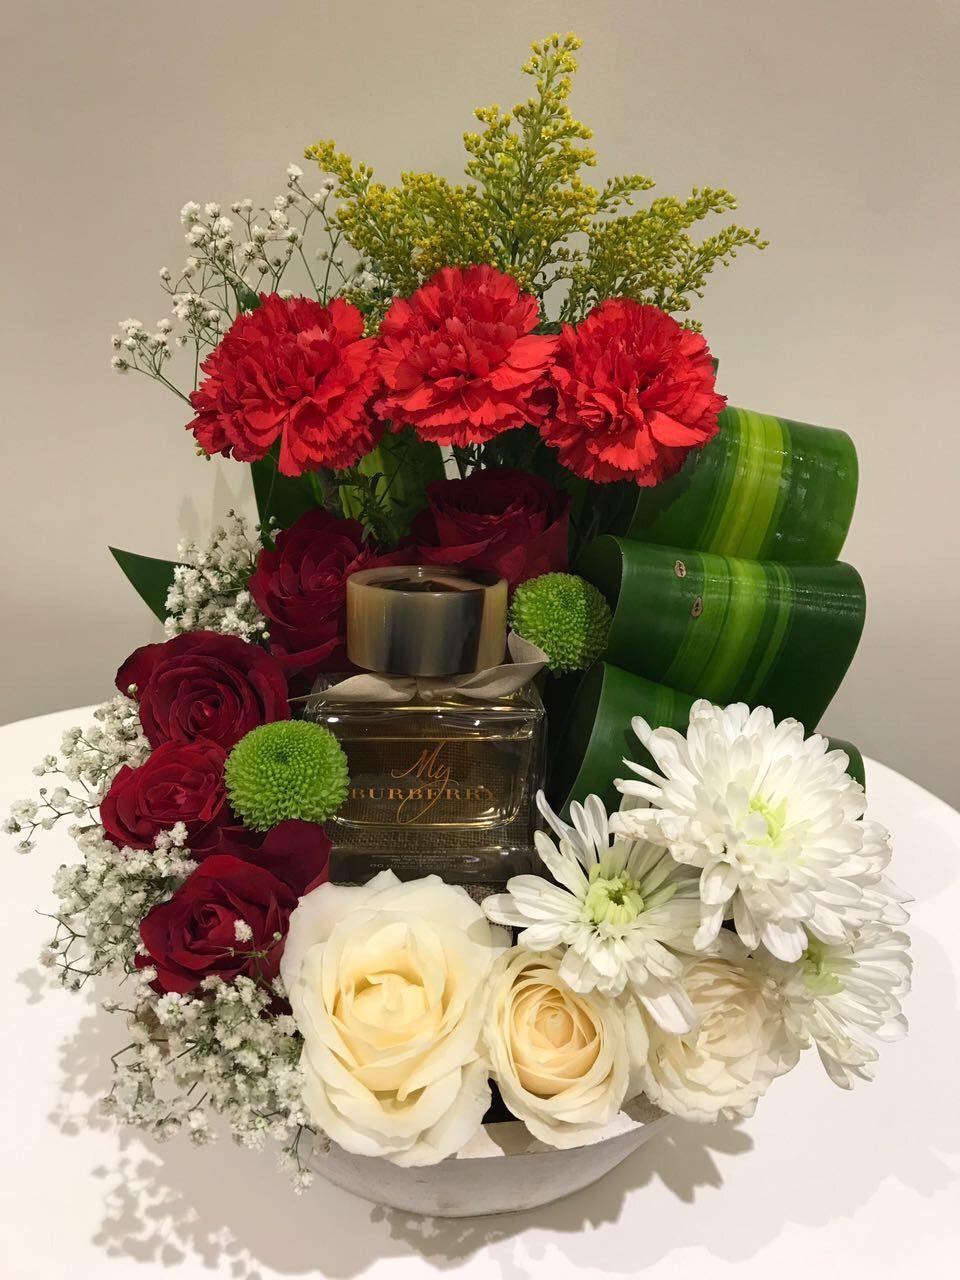 Dailyroses ورد ورد صناعي ورد طبيعي بوكيه ورد فازات فازات ورد تنسيق ورد خشبيات بالونات بالونات ه Flower Gift Ideas Lilac Wedding Bouquet Flower Gift